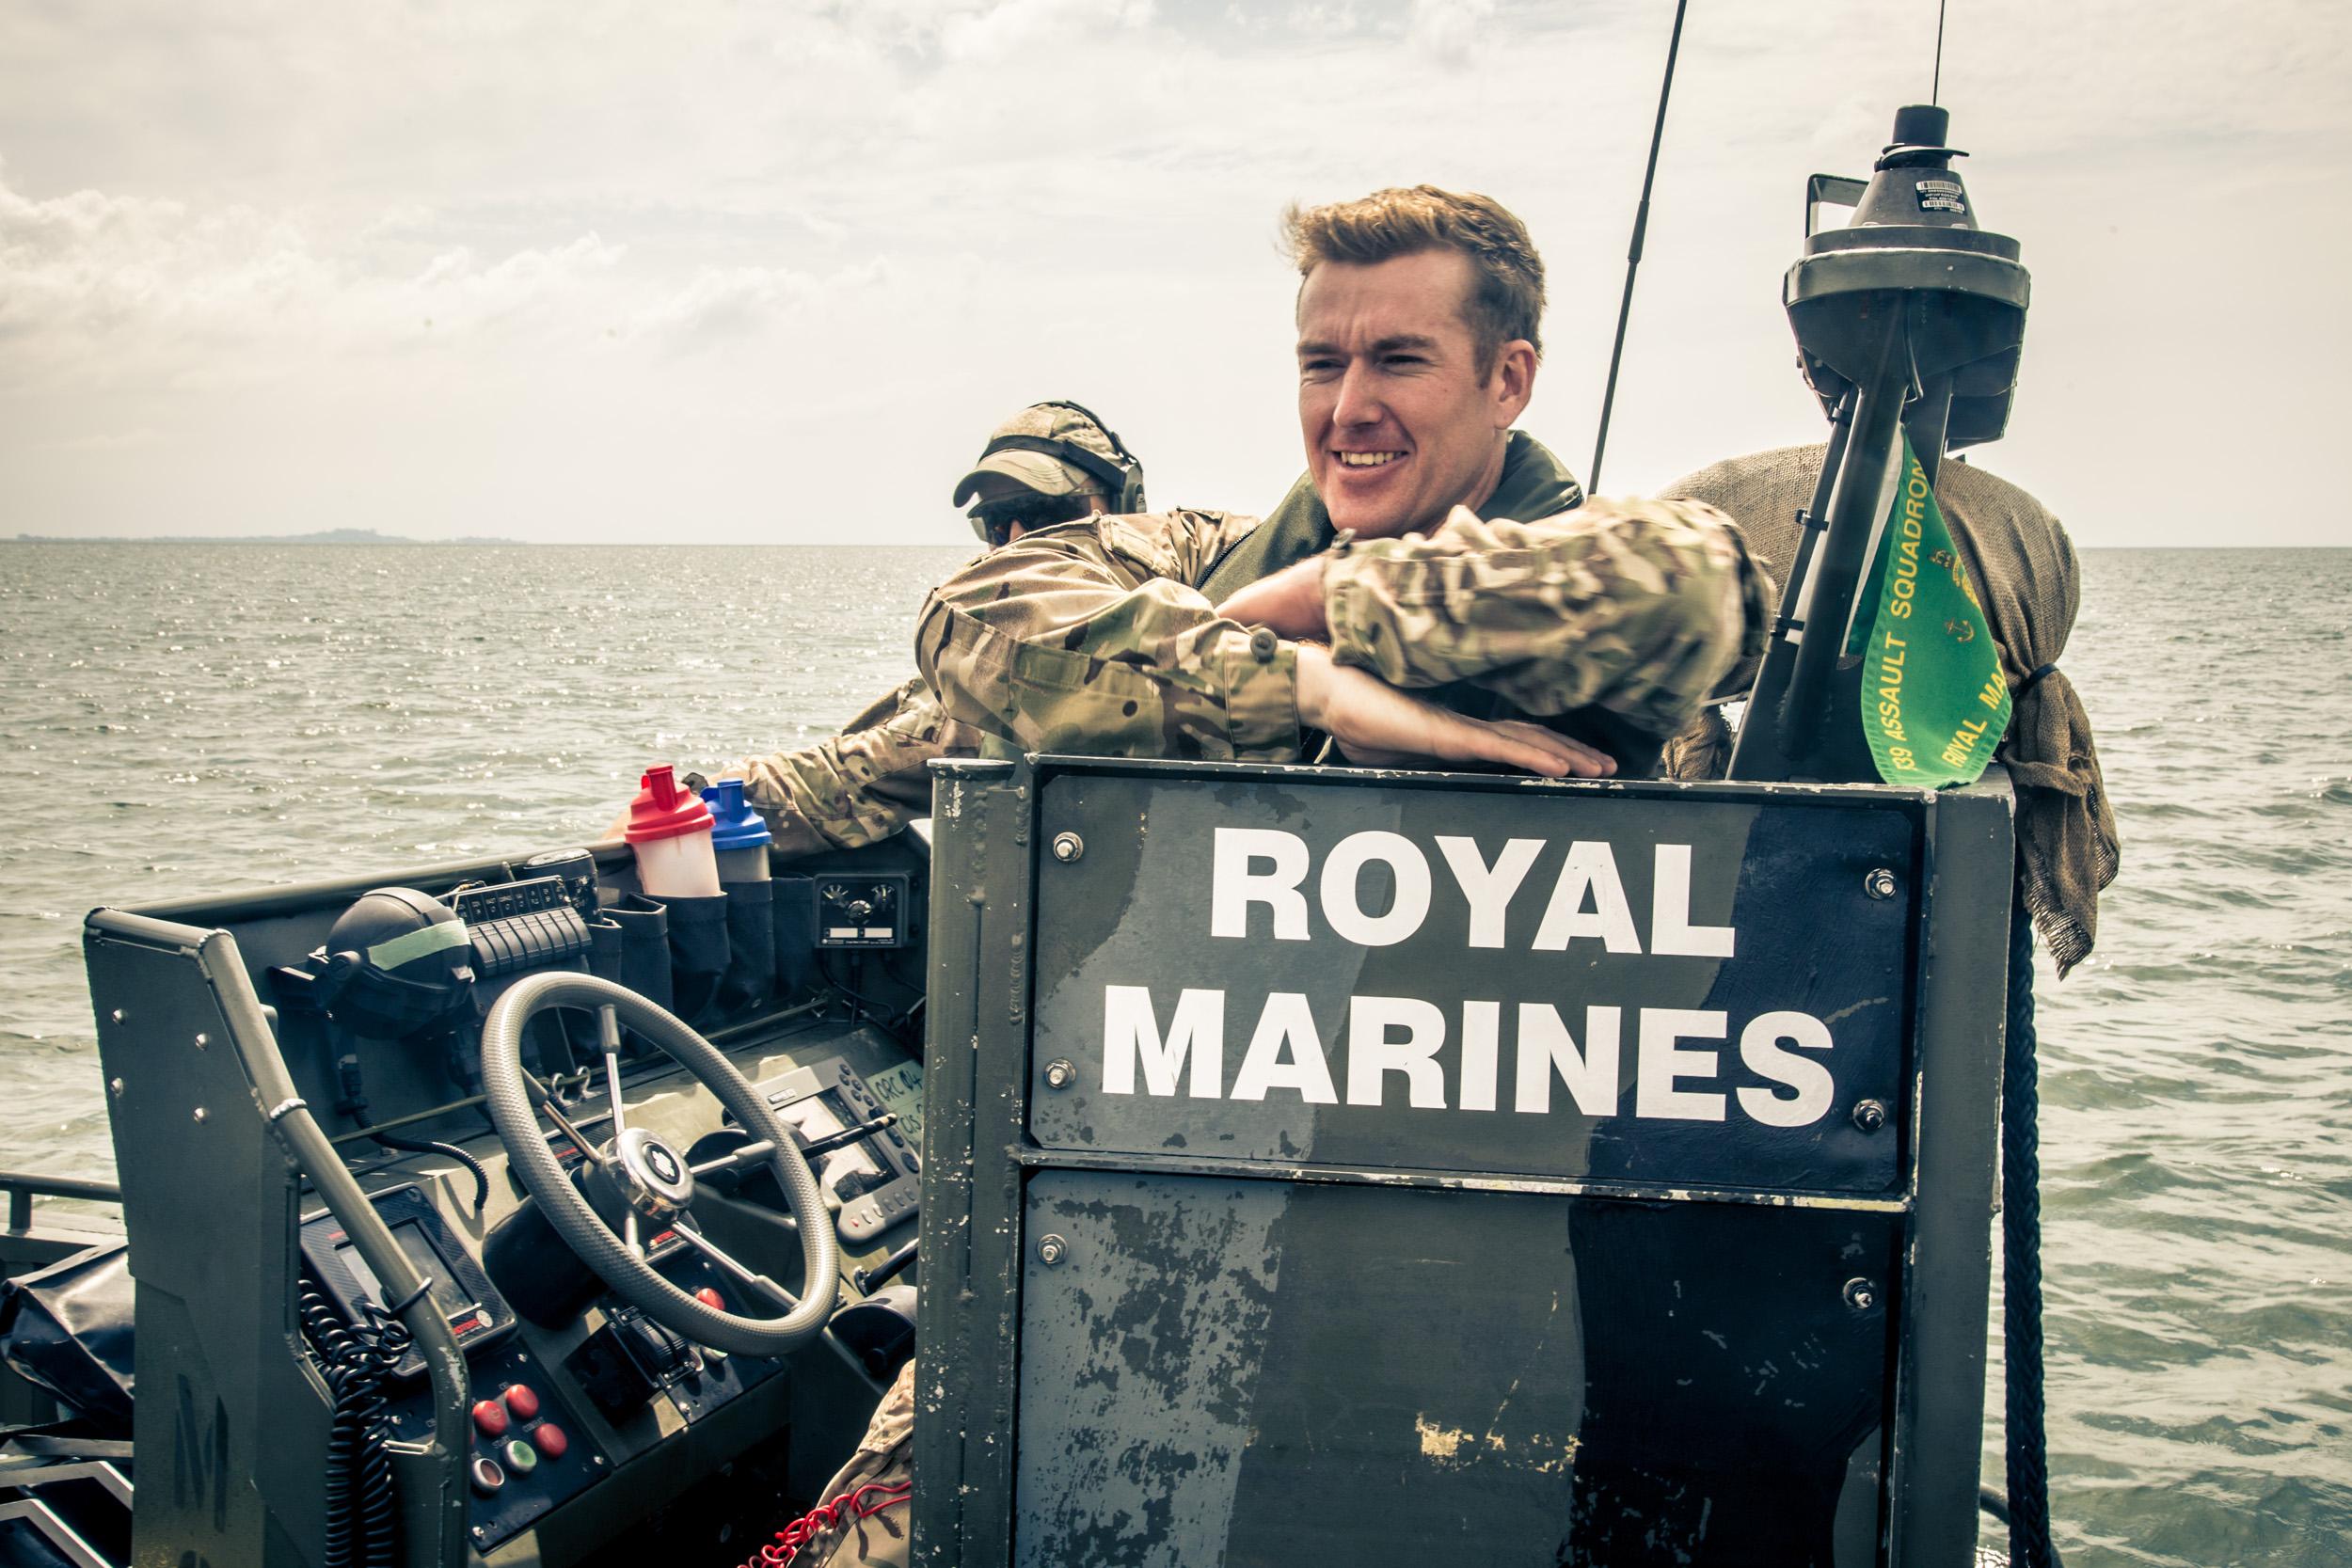 British Royal Marines in Sierra Leone